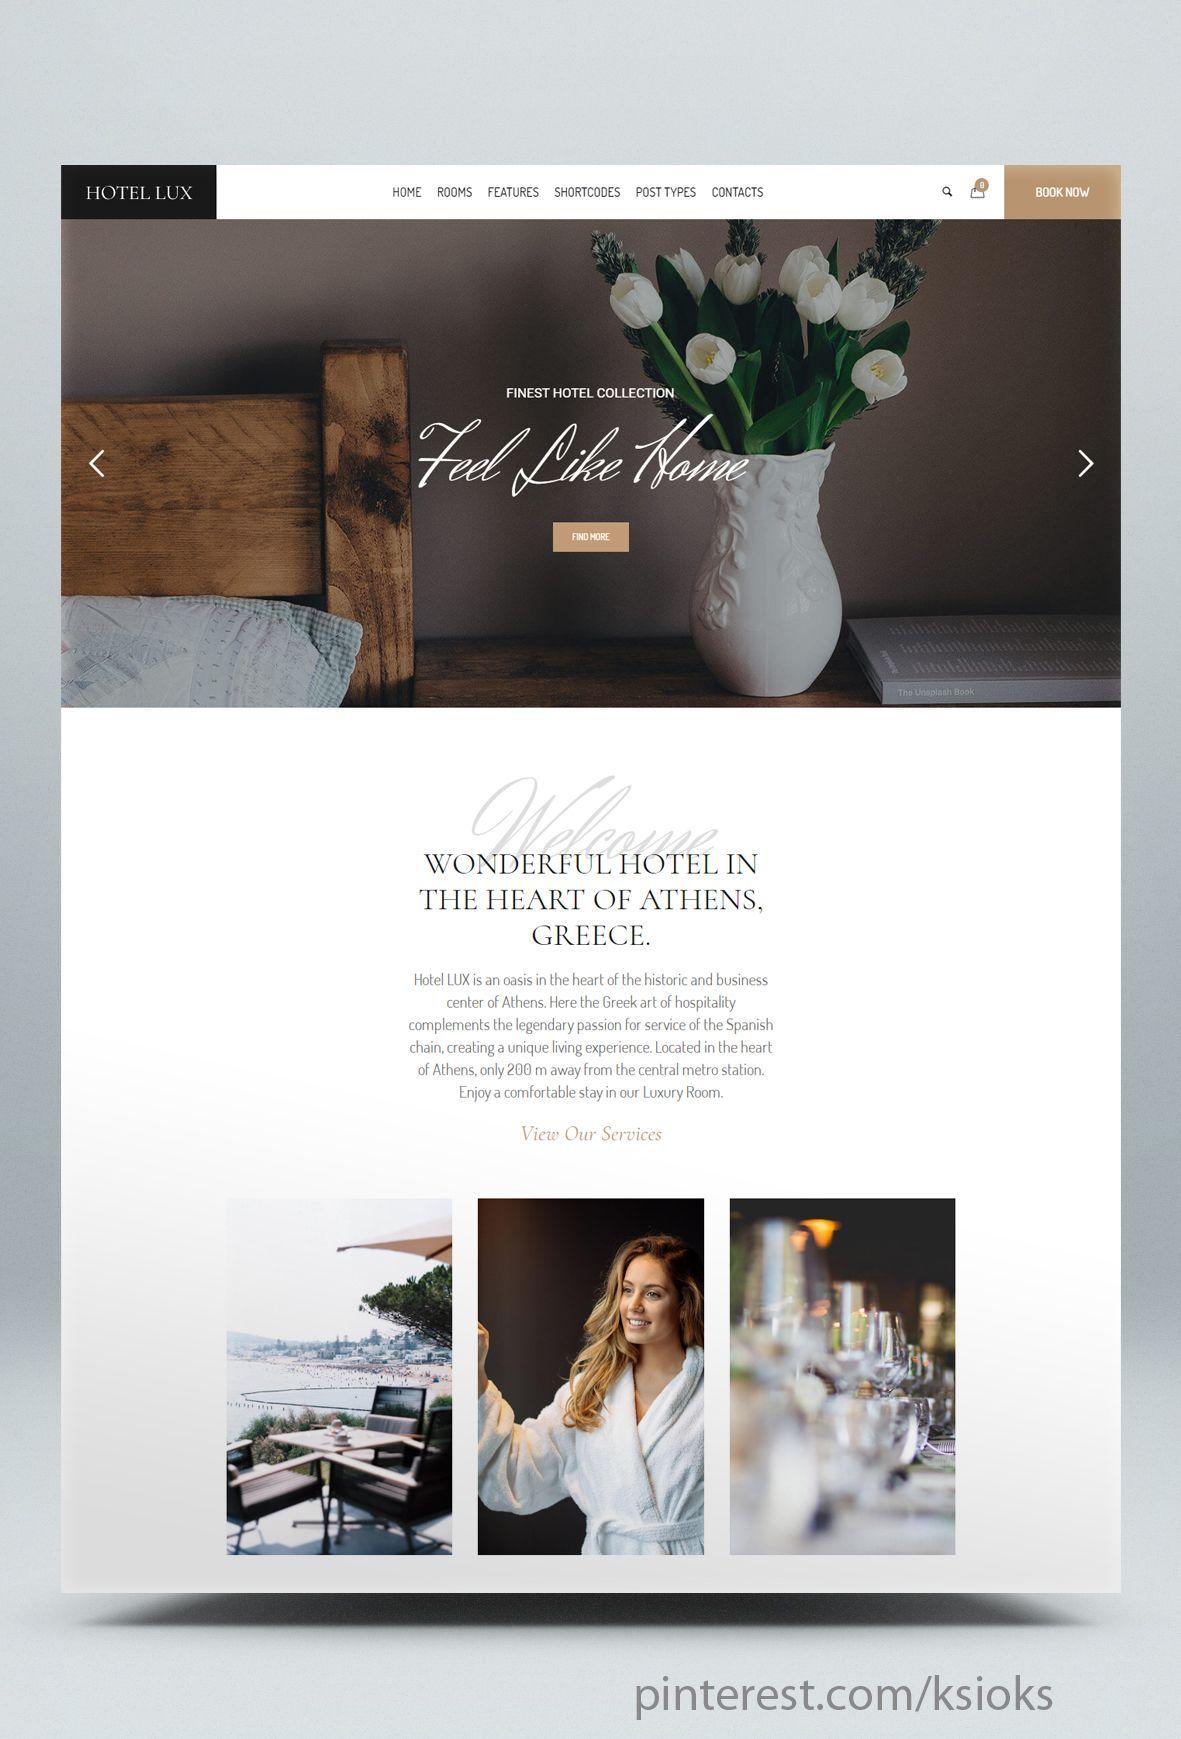 Resort Hotel Wordpress Theme Hotel Website Design Hotel Website Hotel